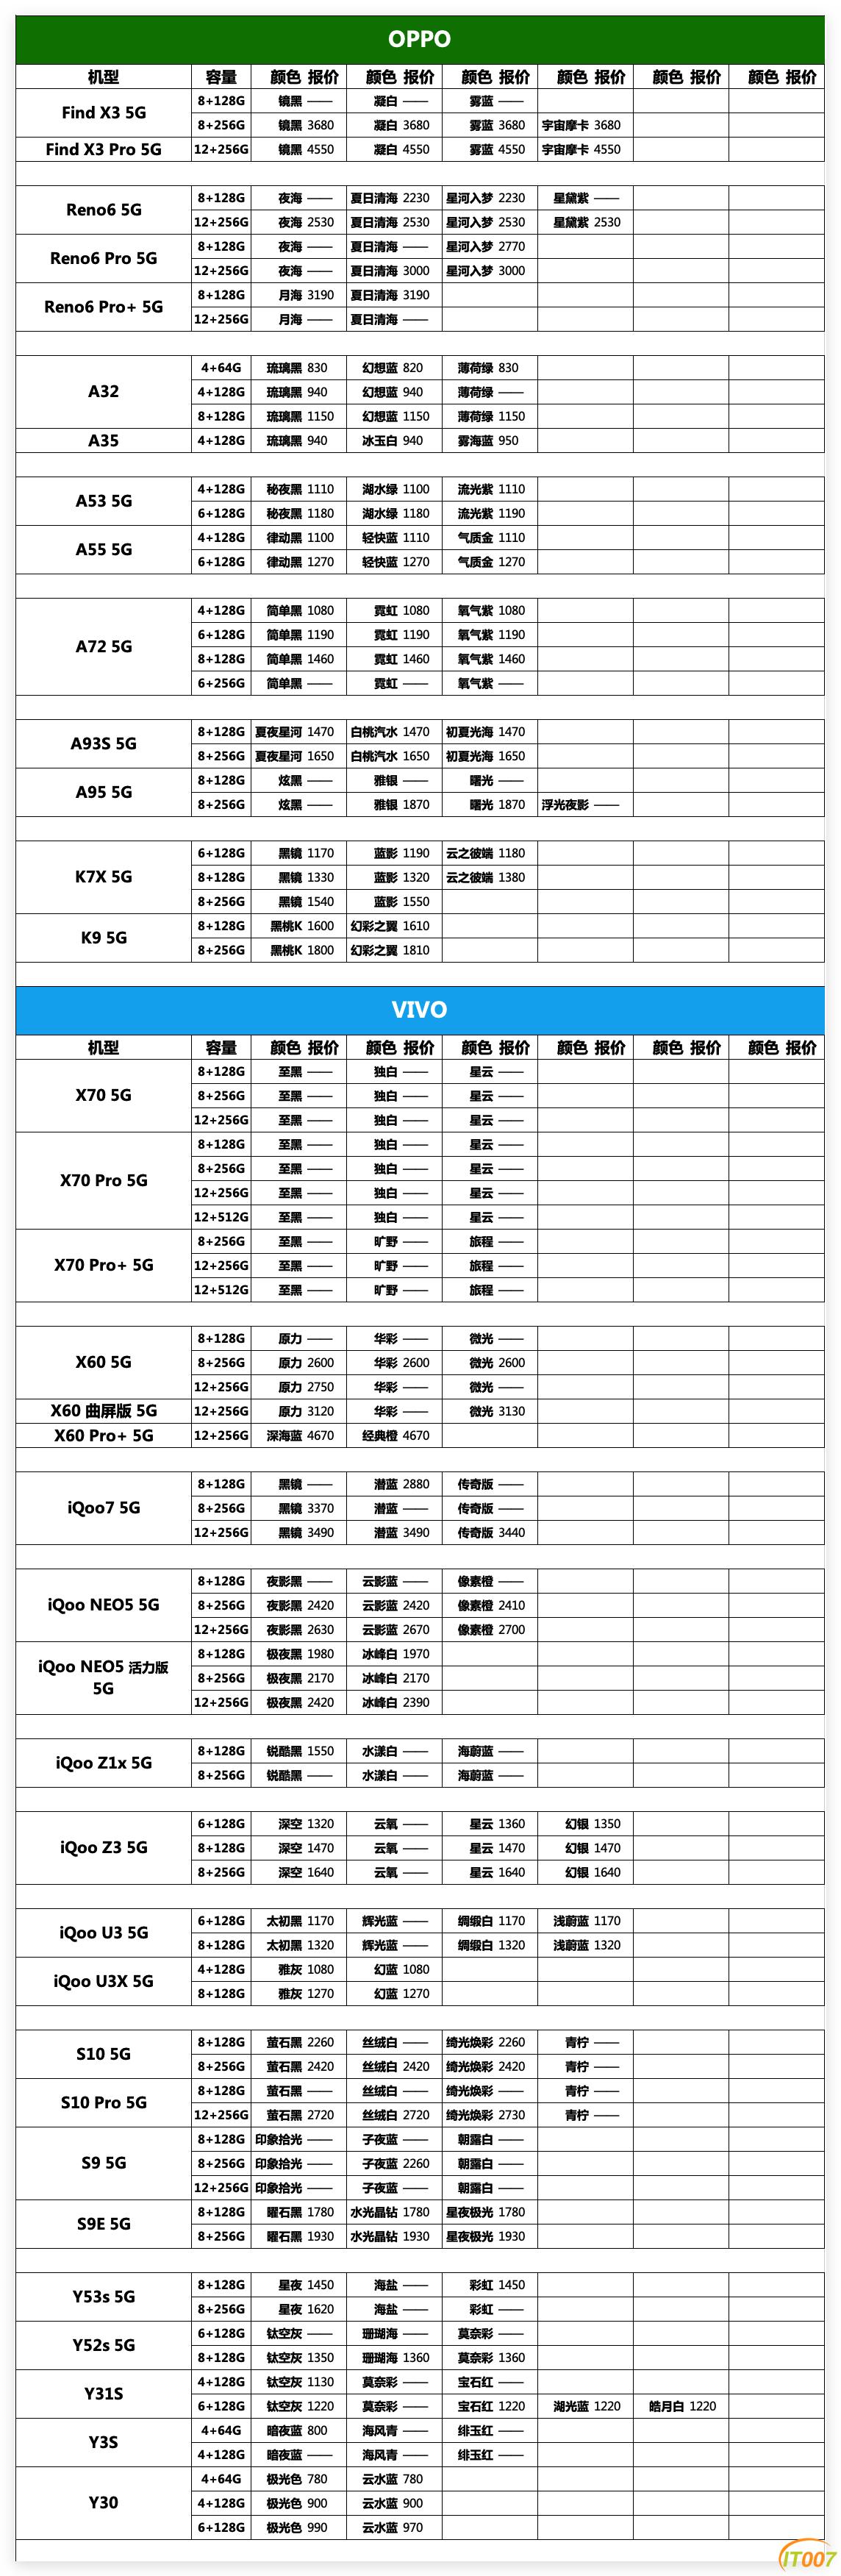 Xnip2021-09-13_16-26-39.png